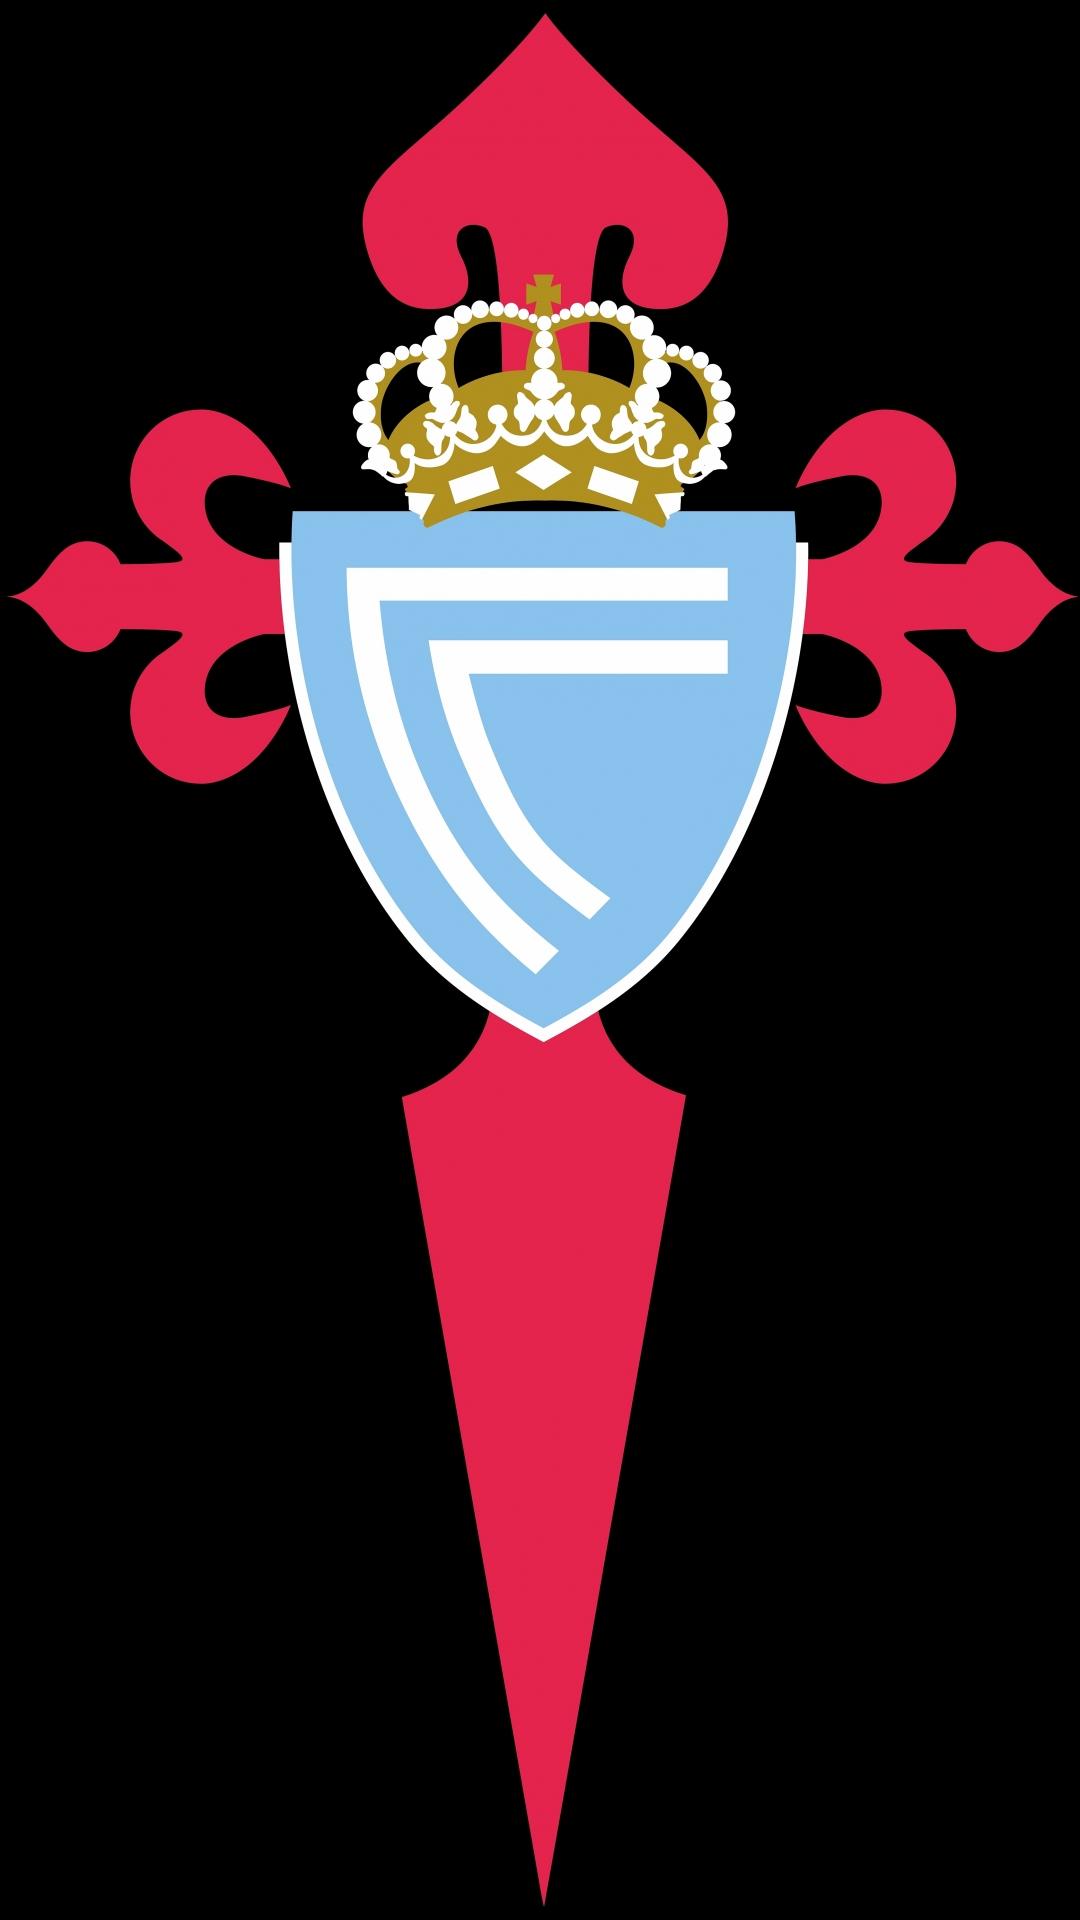 SportsCelta De Vigo 1080x1920 Wallpaper ID 556560   Mobile Abyss 1080x1920